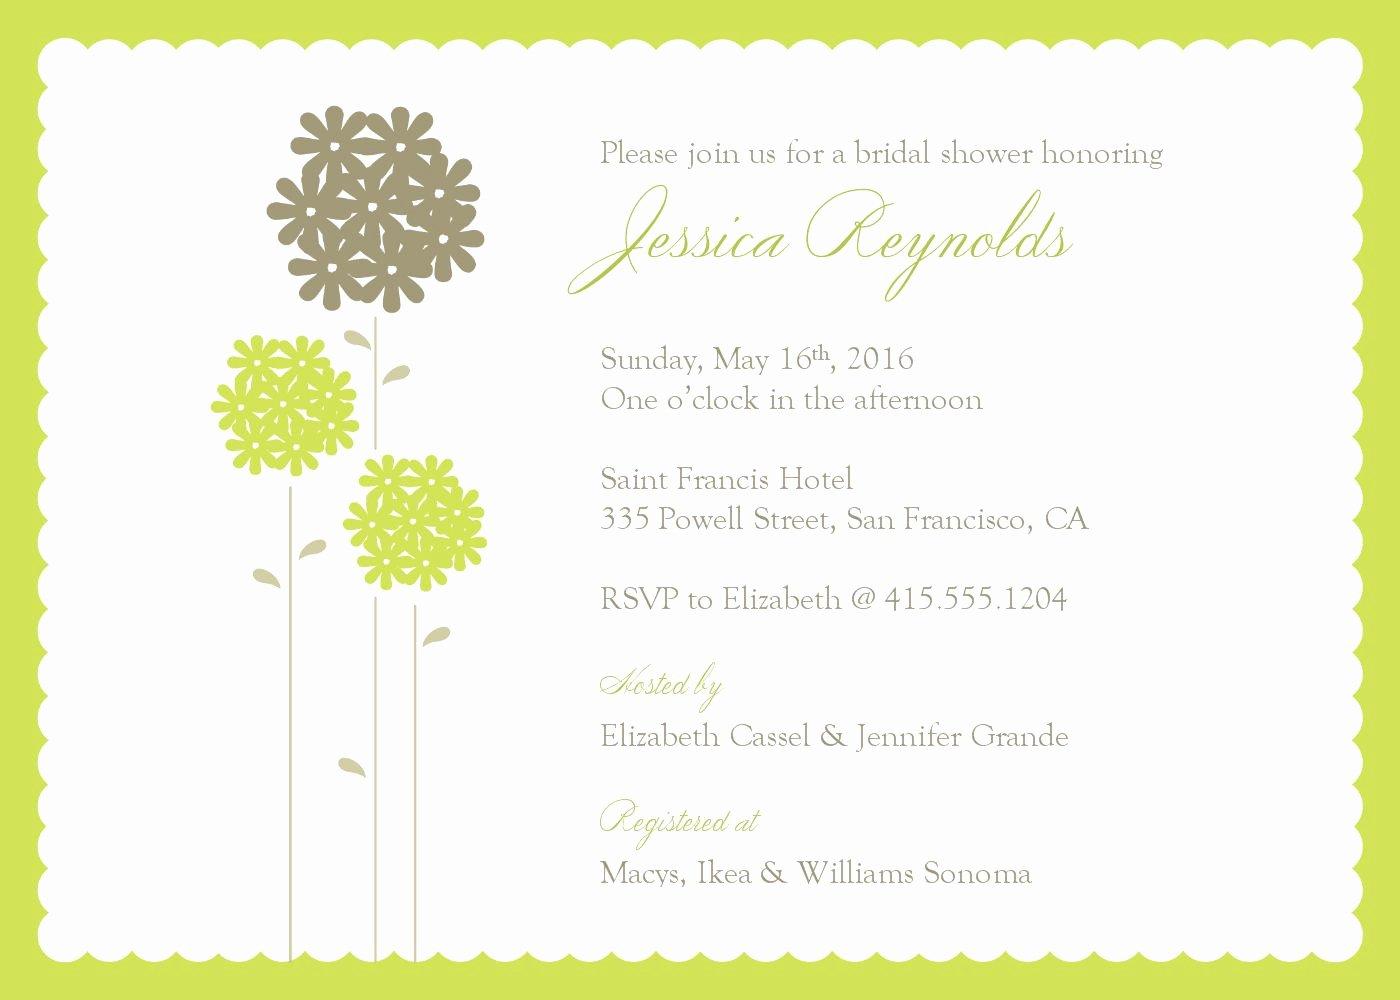 Invitation Word Templates Free Wedding Invitation Word